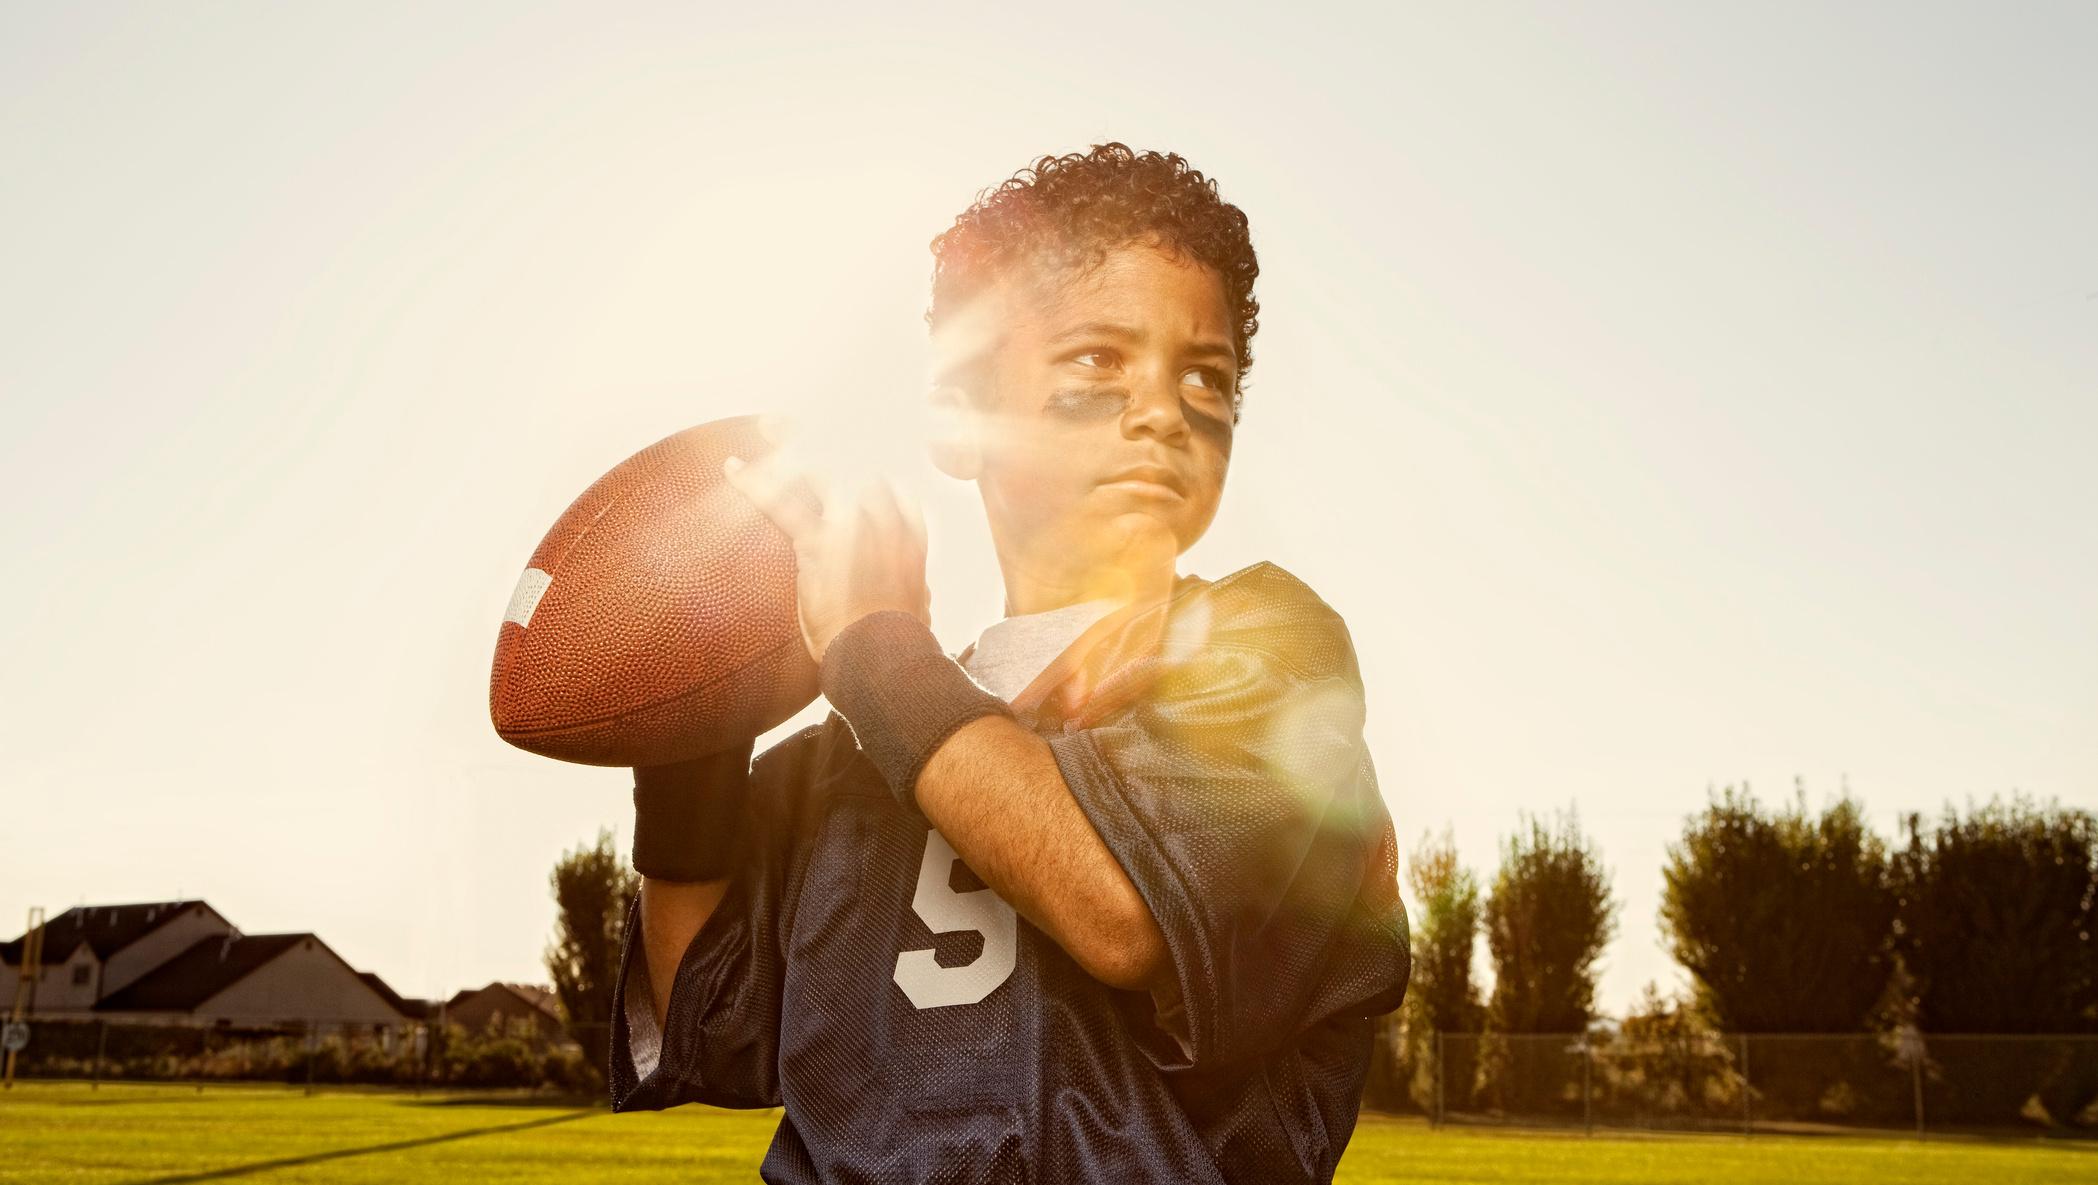 Football-Inspired Faith Lessons for Kids